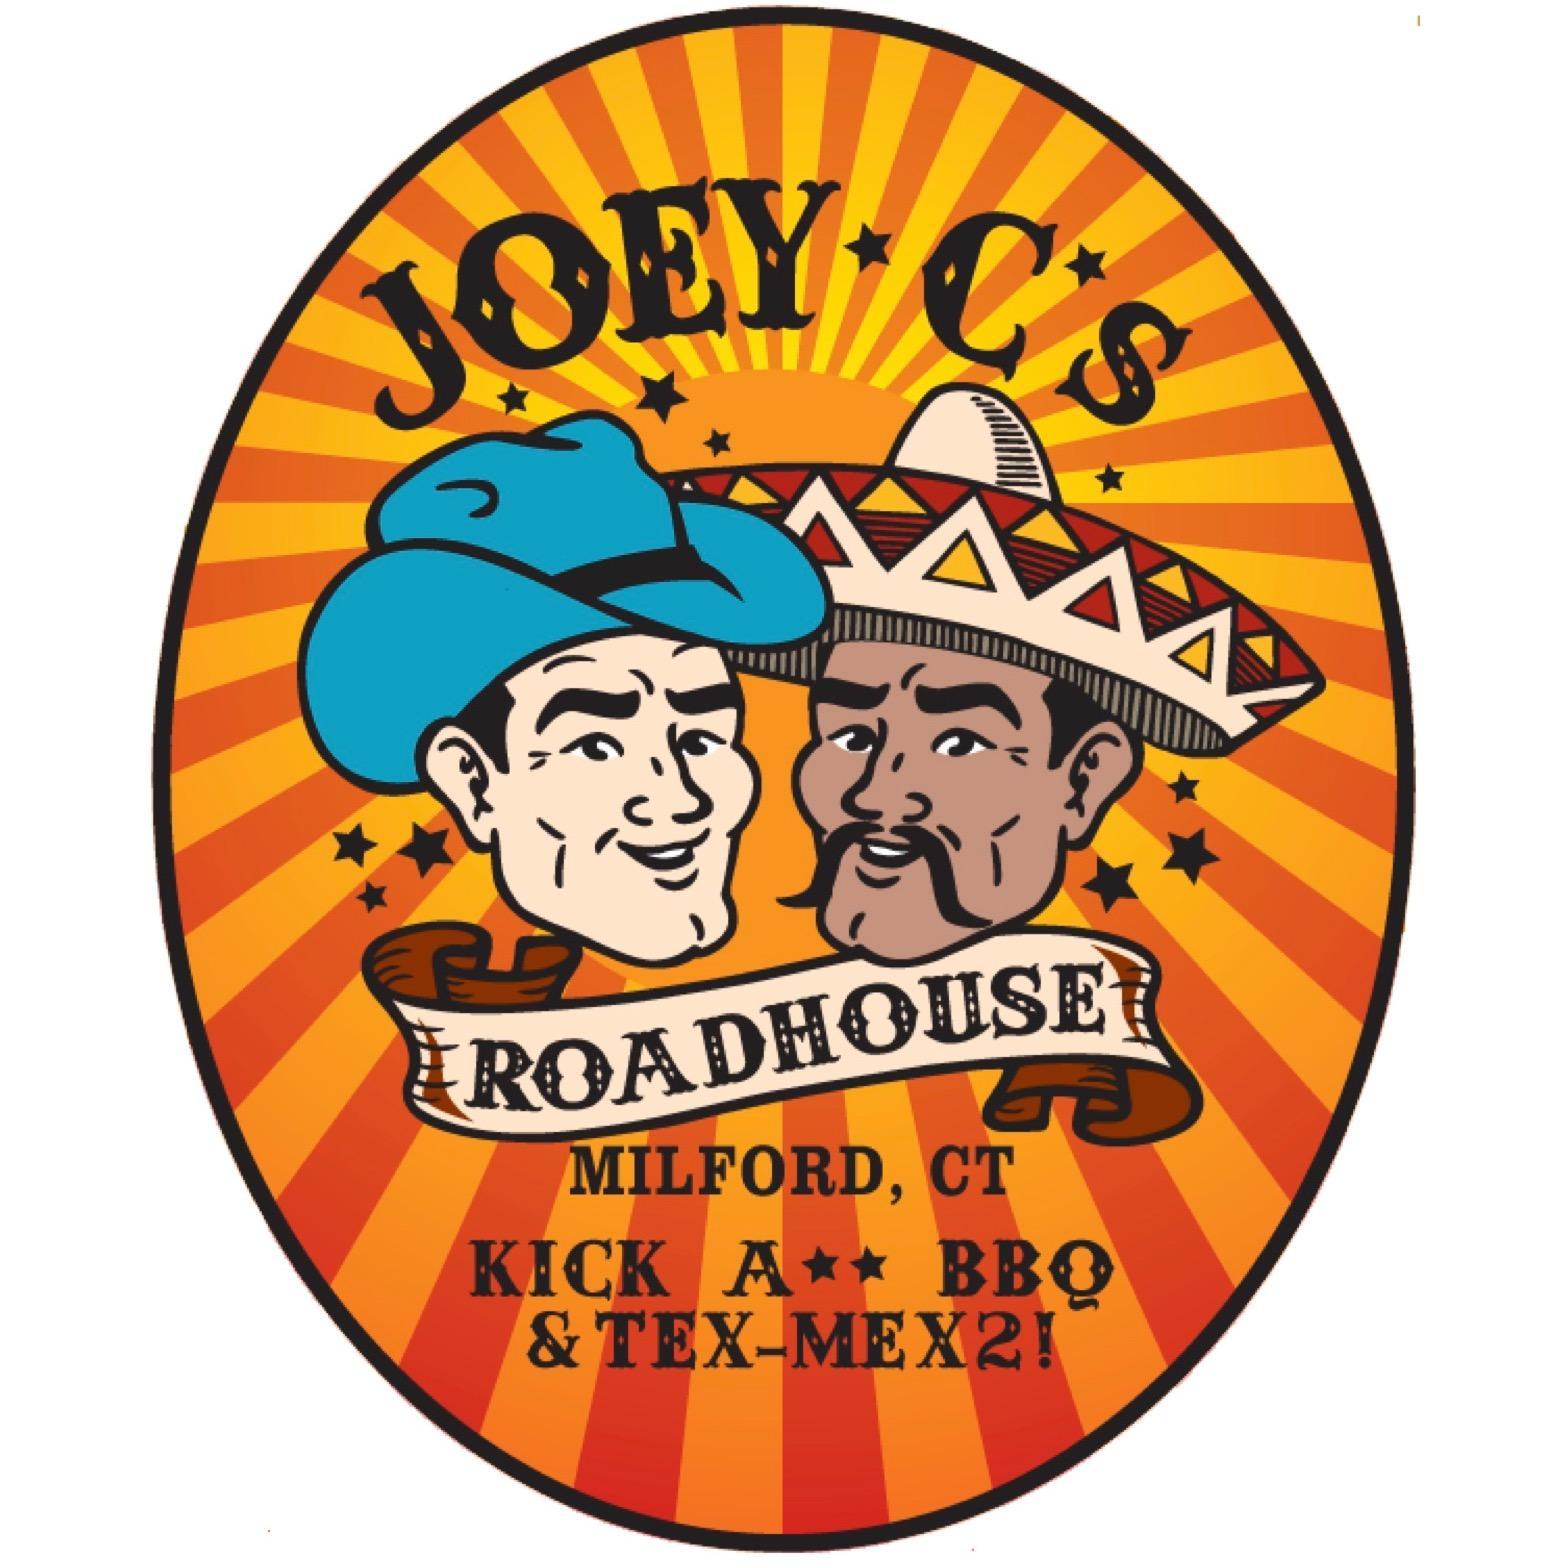 JOEY C'S ROADHOUSE image 12